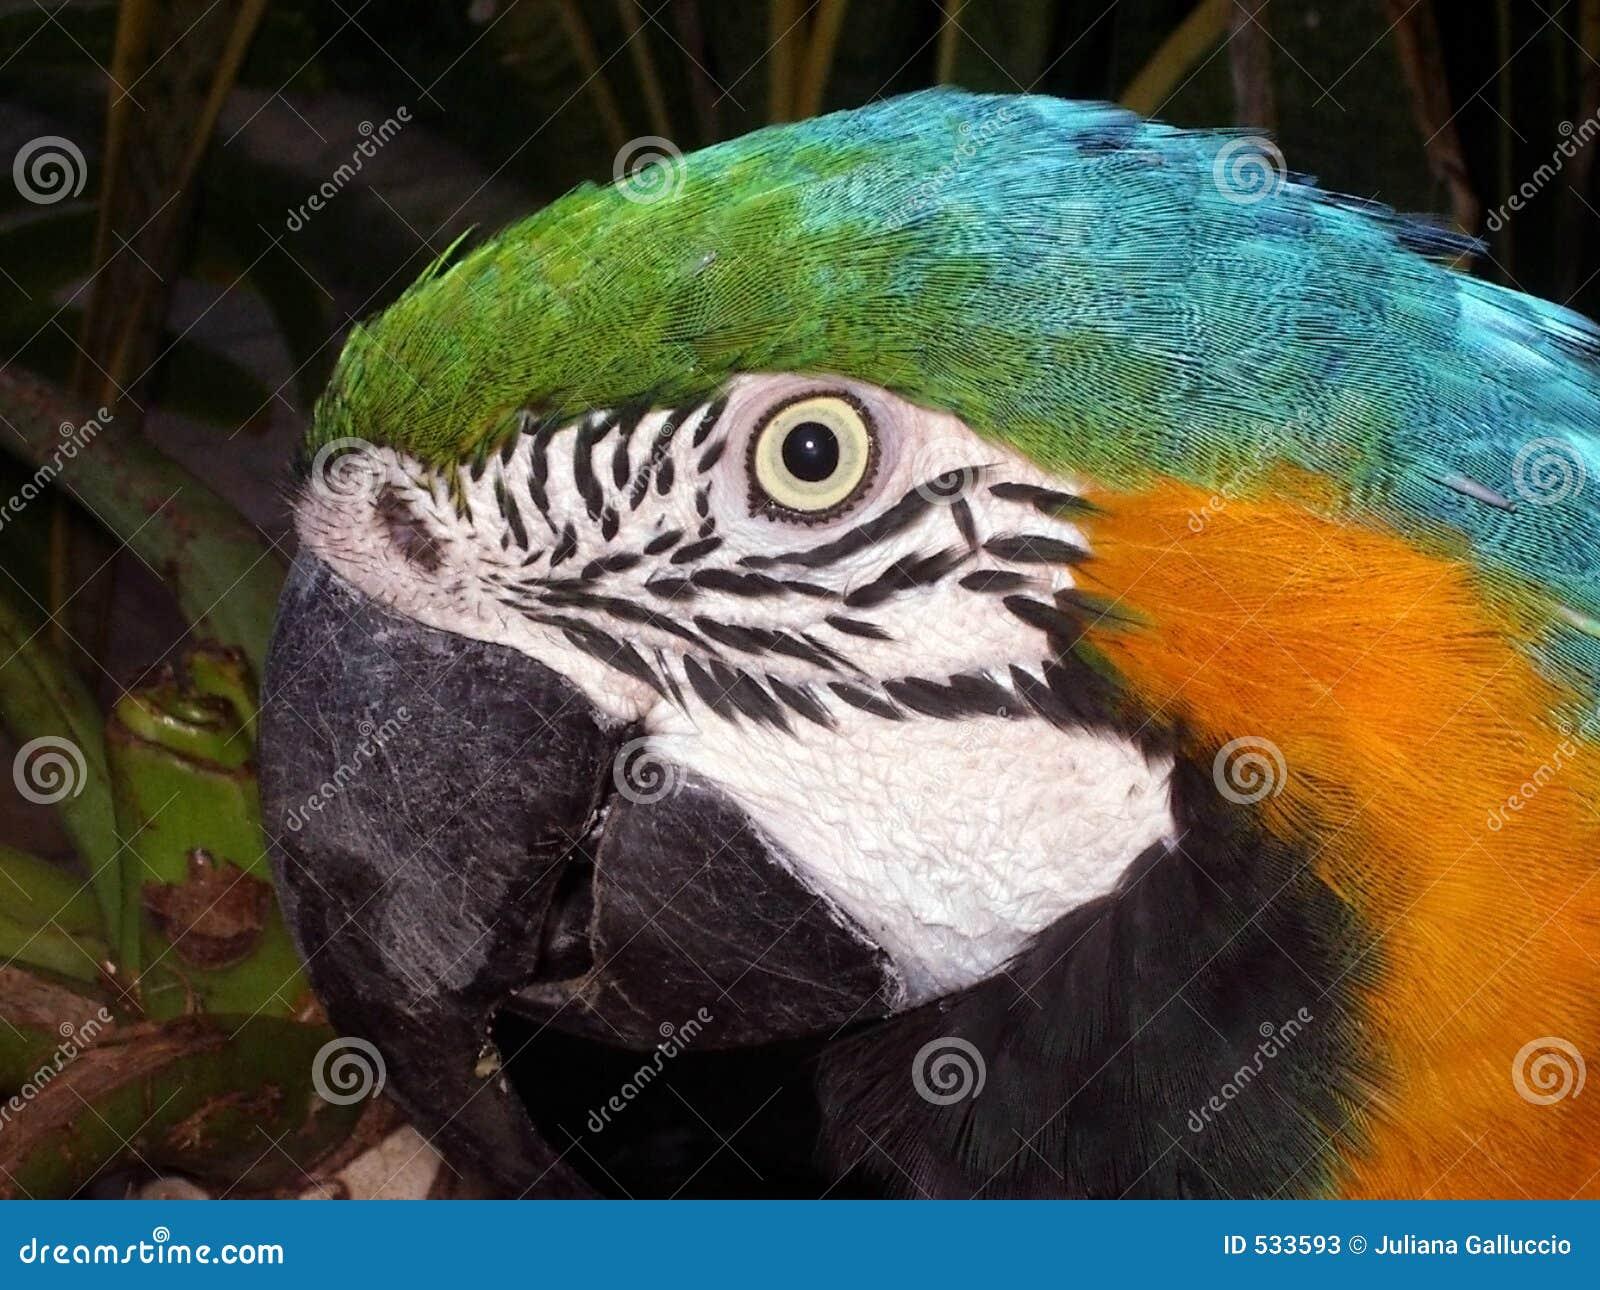 Download 顶头鹦鹉 库存图片. 图片 包括有 颜色, 眼睛, 烧杯, 敌意, 宏指令, 广告牌, 题头, 双翼飞机, 异乎寻常 - 533593